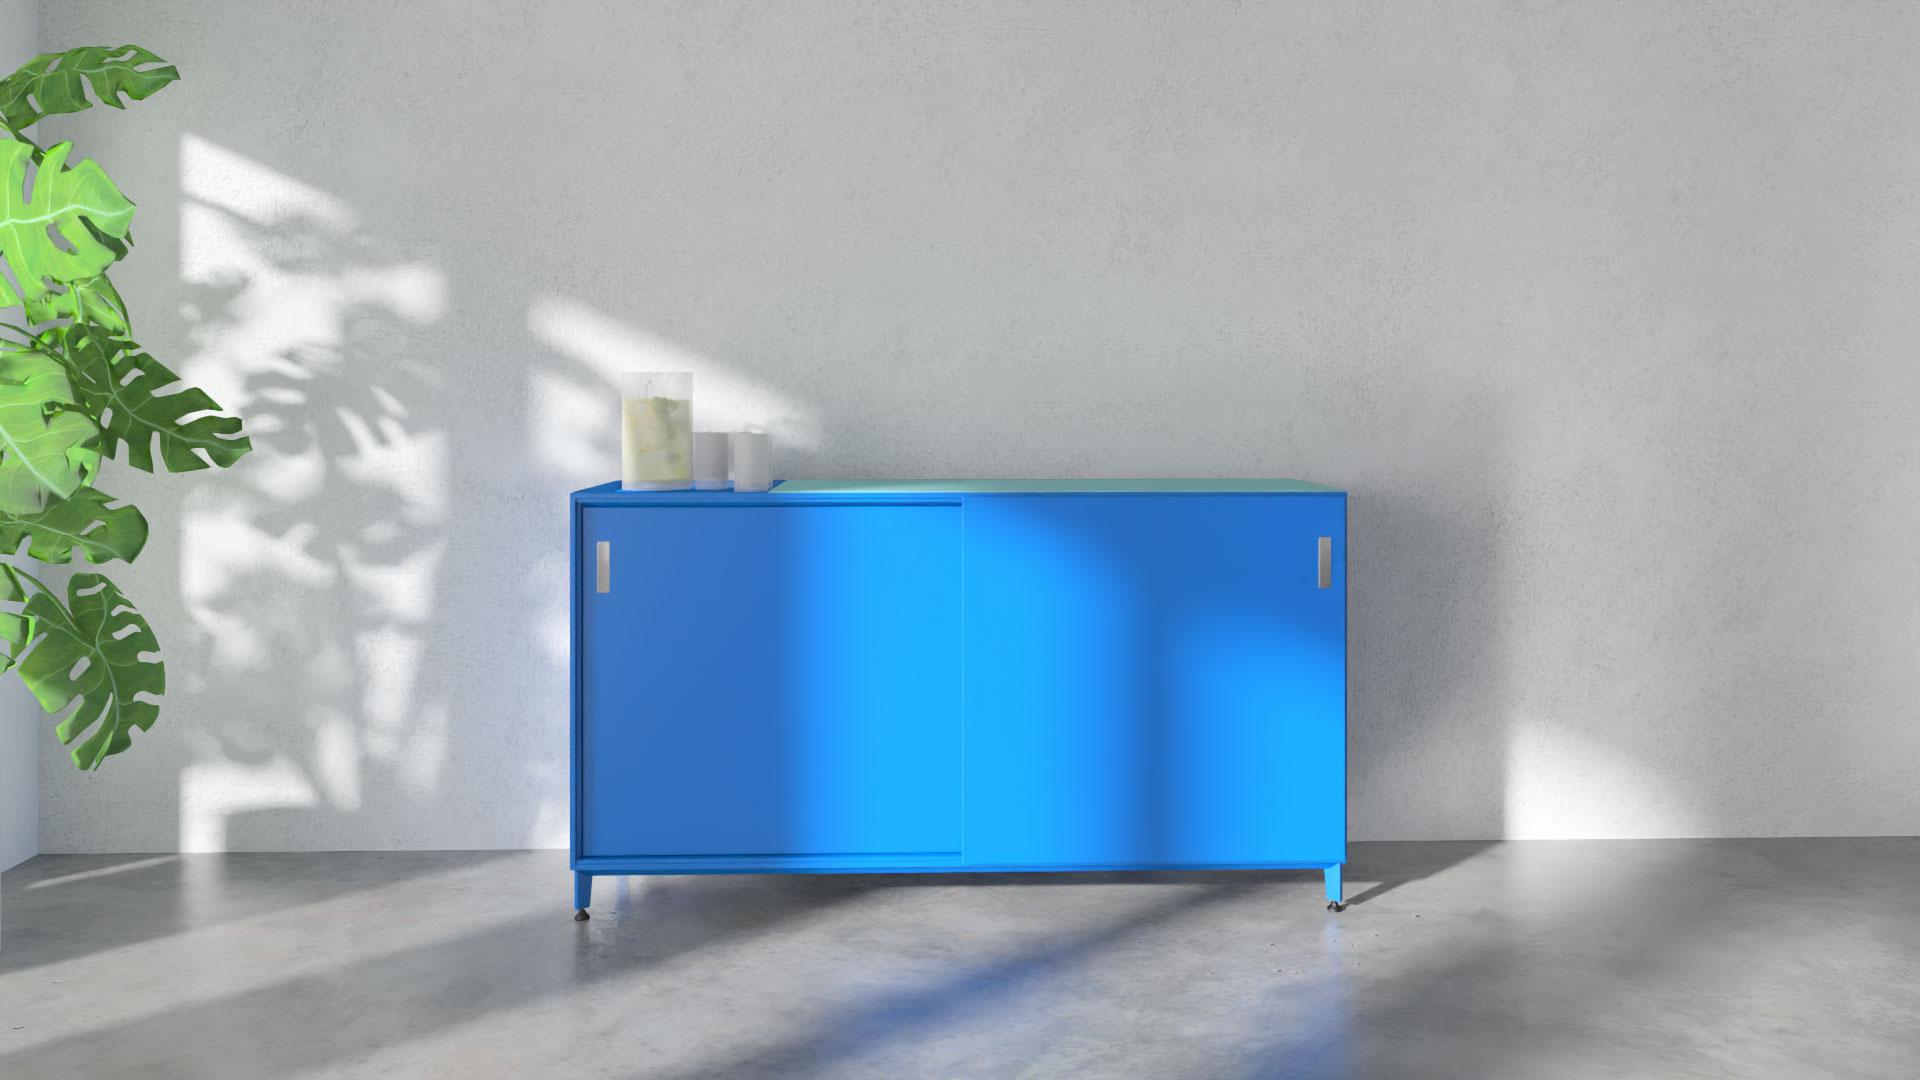 Design-Moebel-Schiebetuerenschrank-auf-Living-Gestell-xitan-s-mauser-16-9